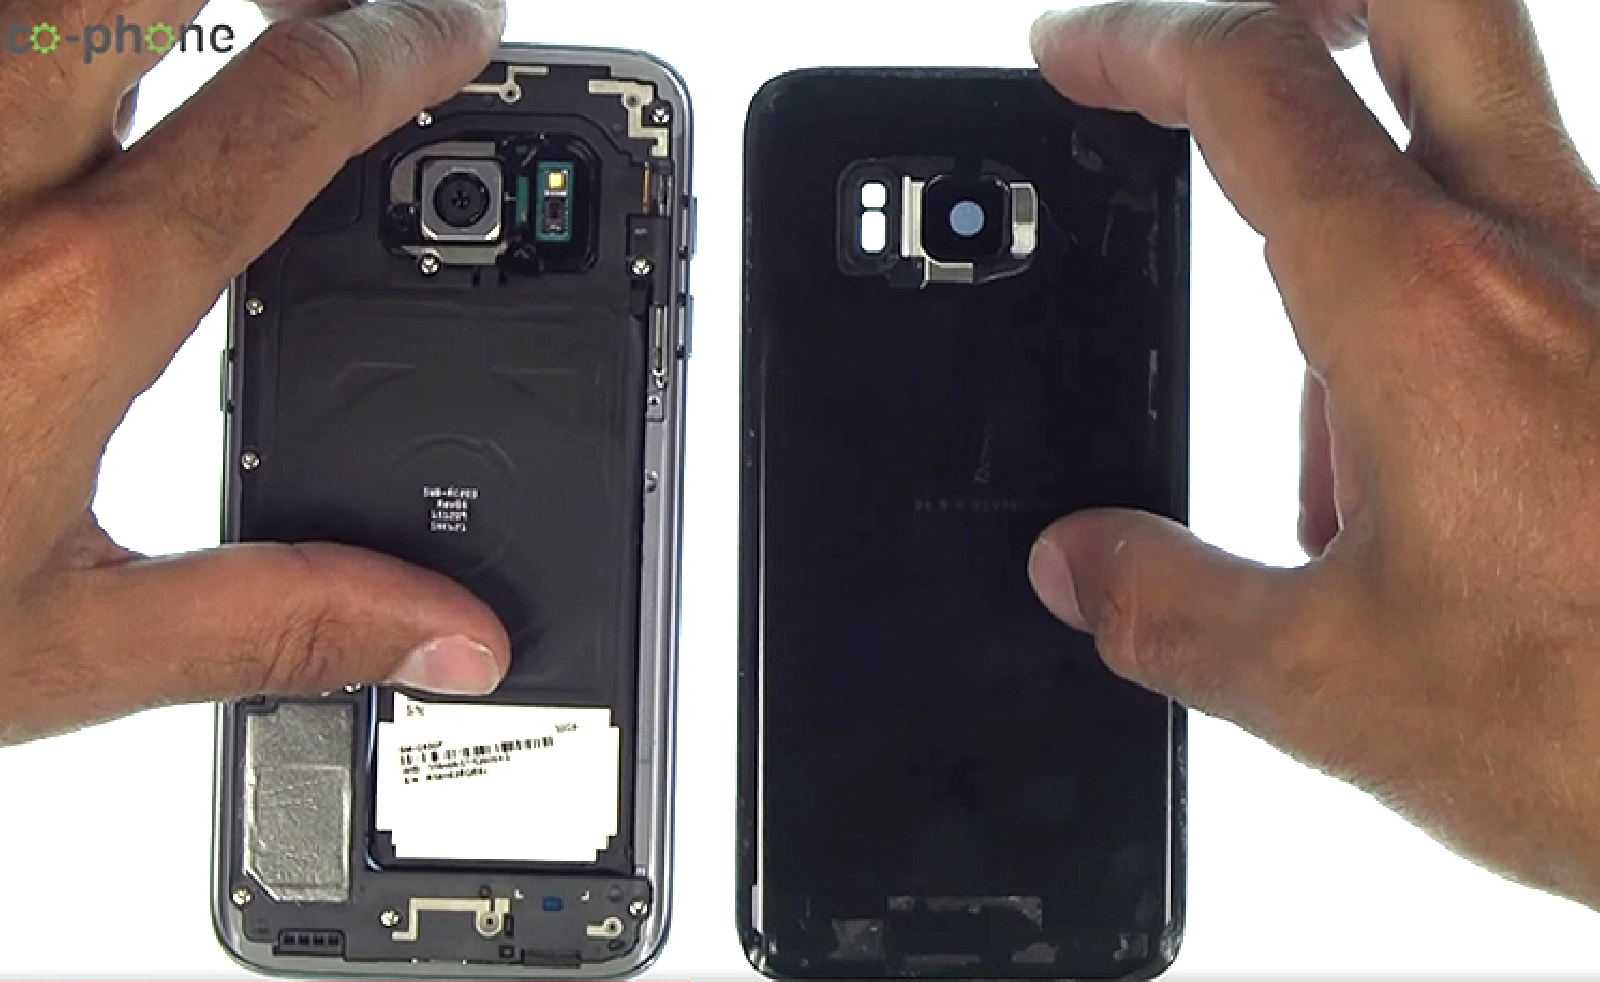 Etape 4: Retirer le cache batterie